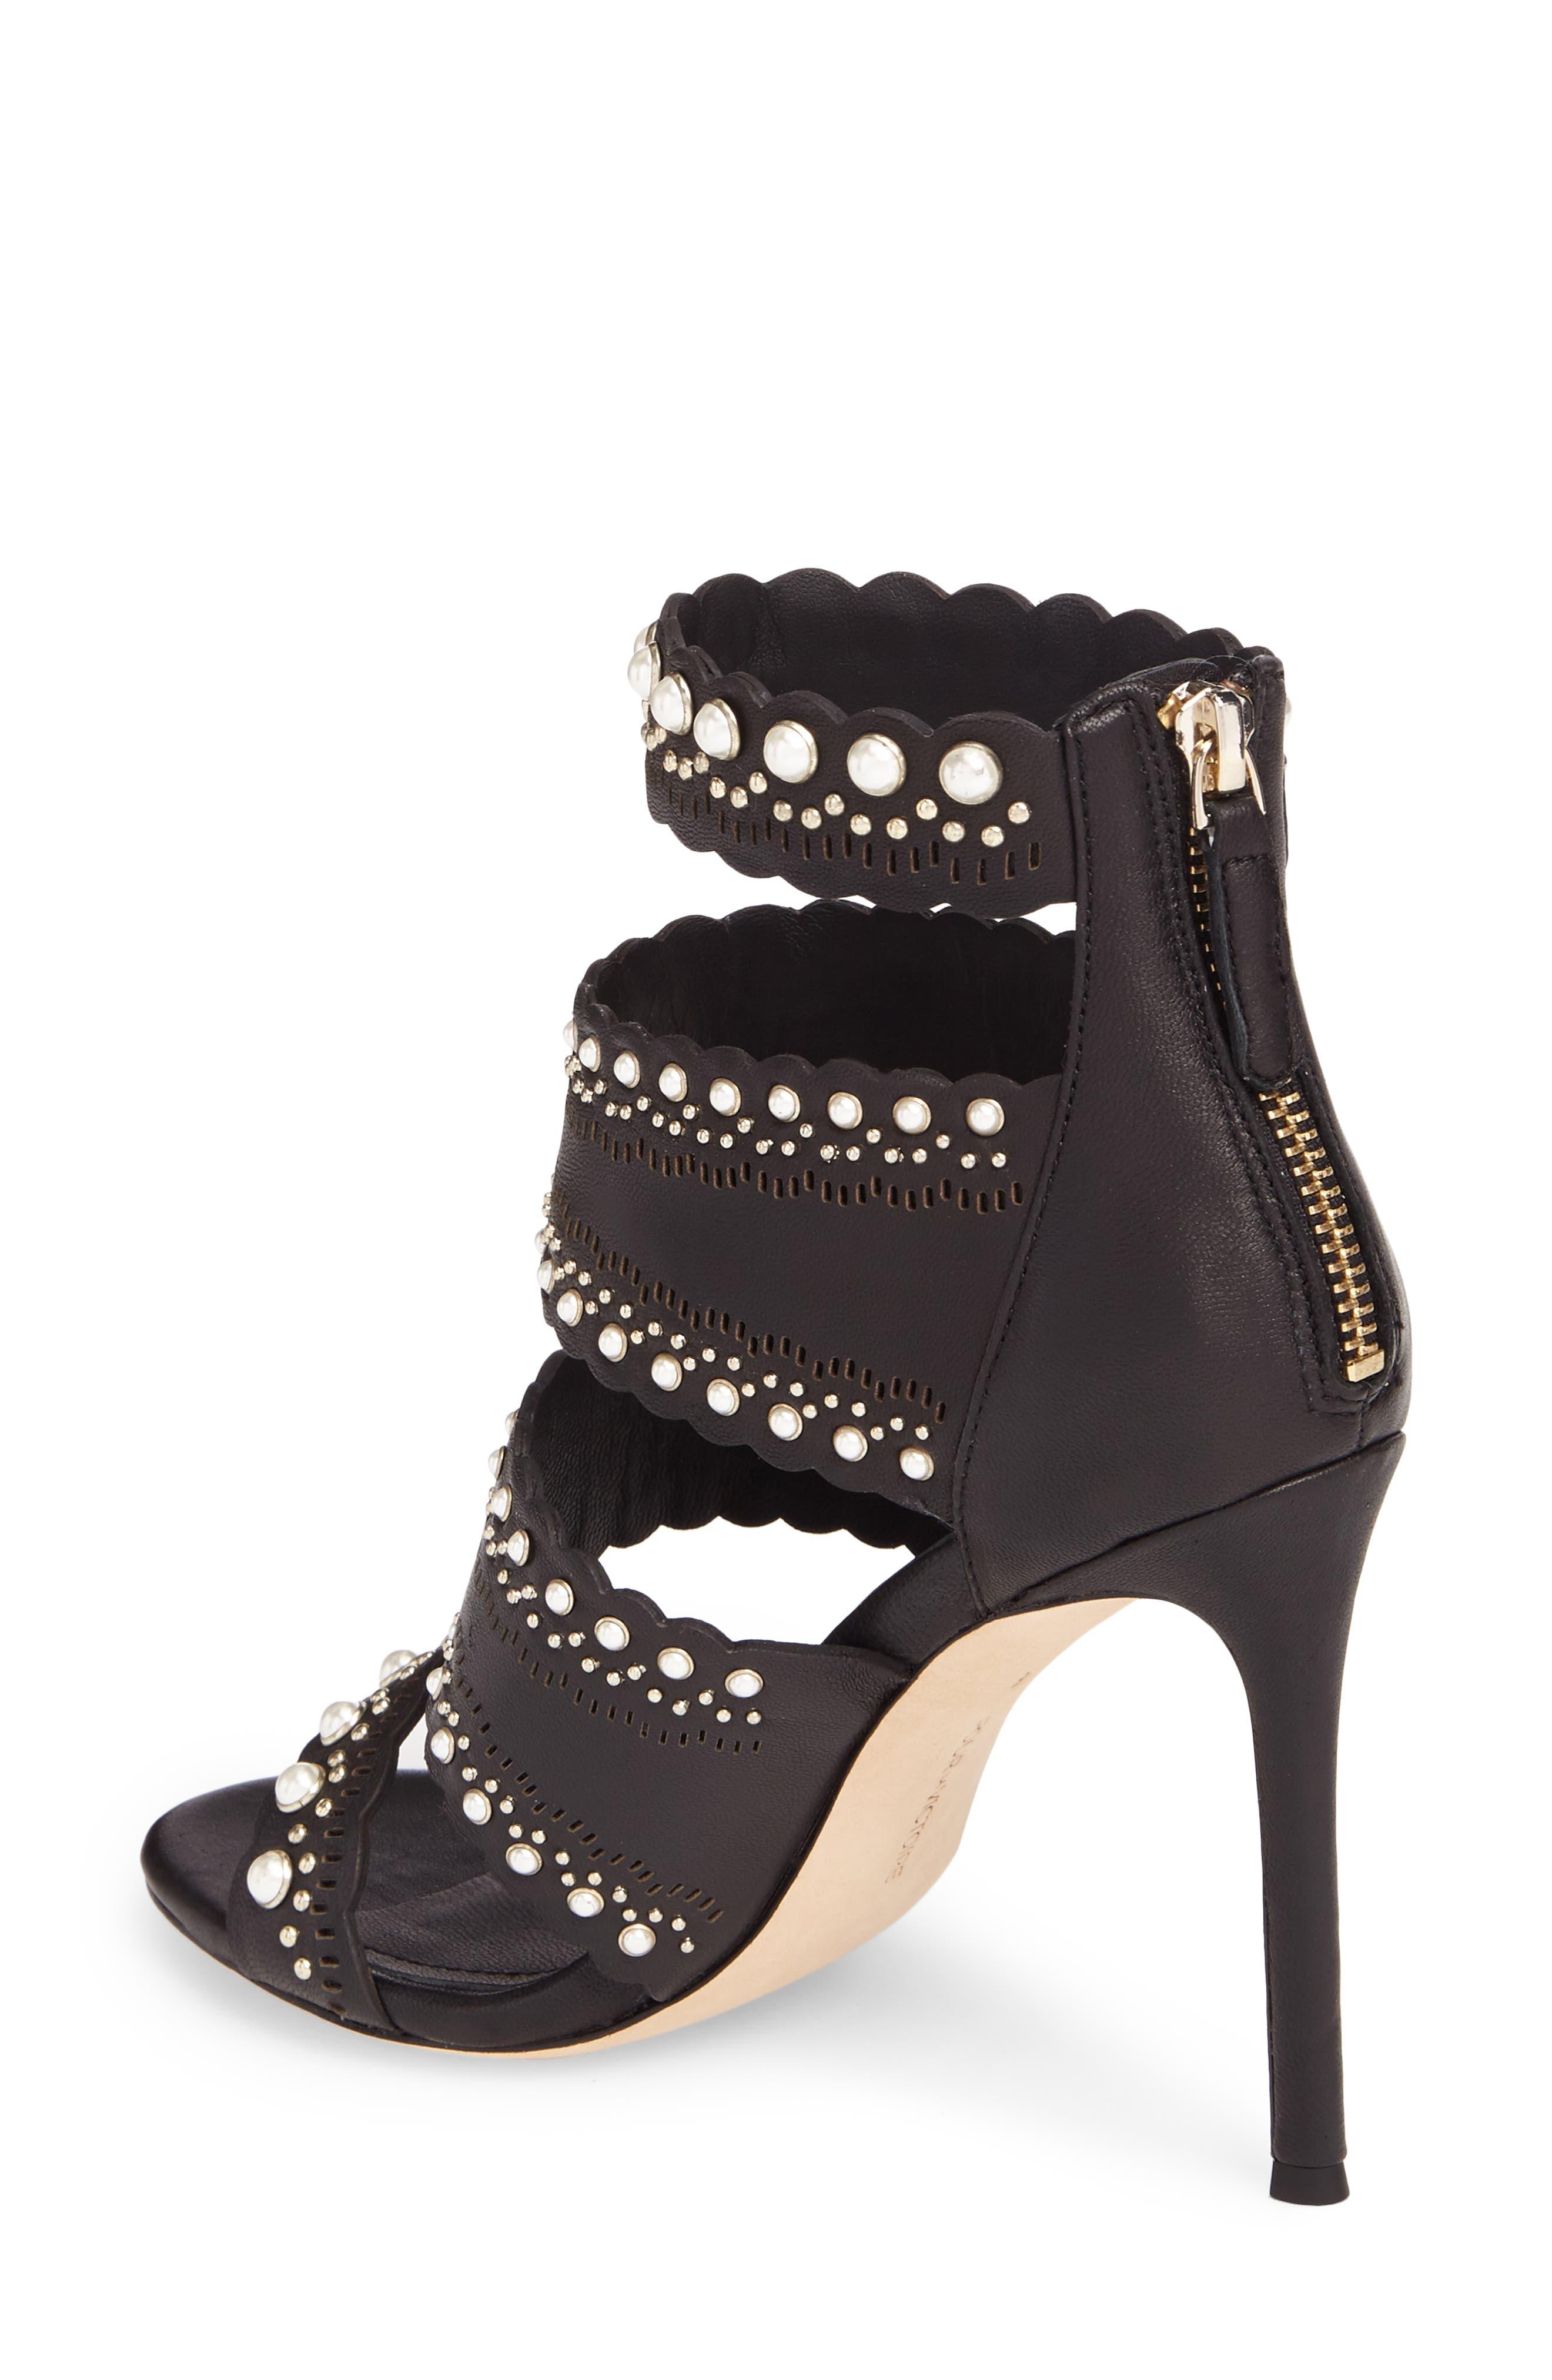 Ellura Scalloped Strap Sandal,                             Alternate thumbnail 2, color,                             Black Leather